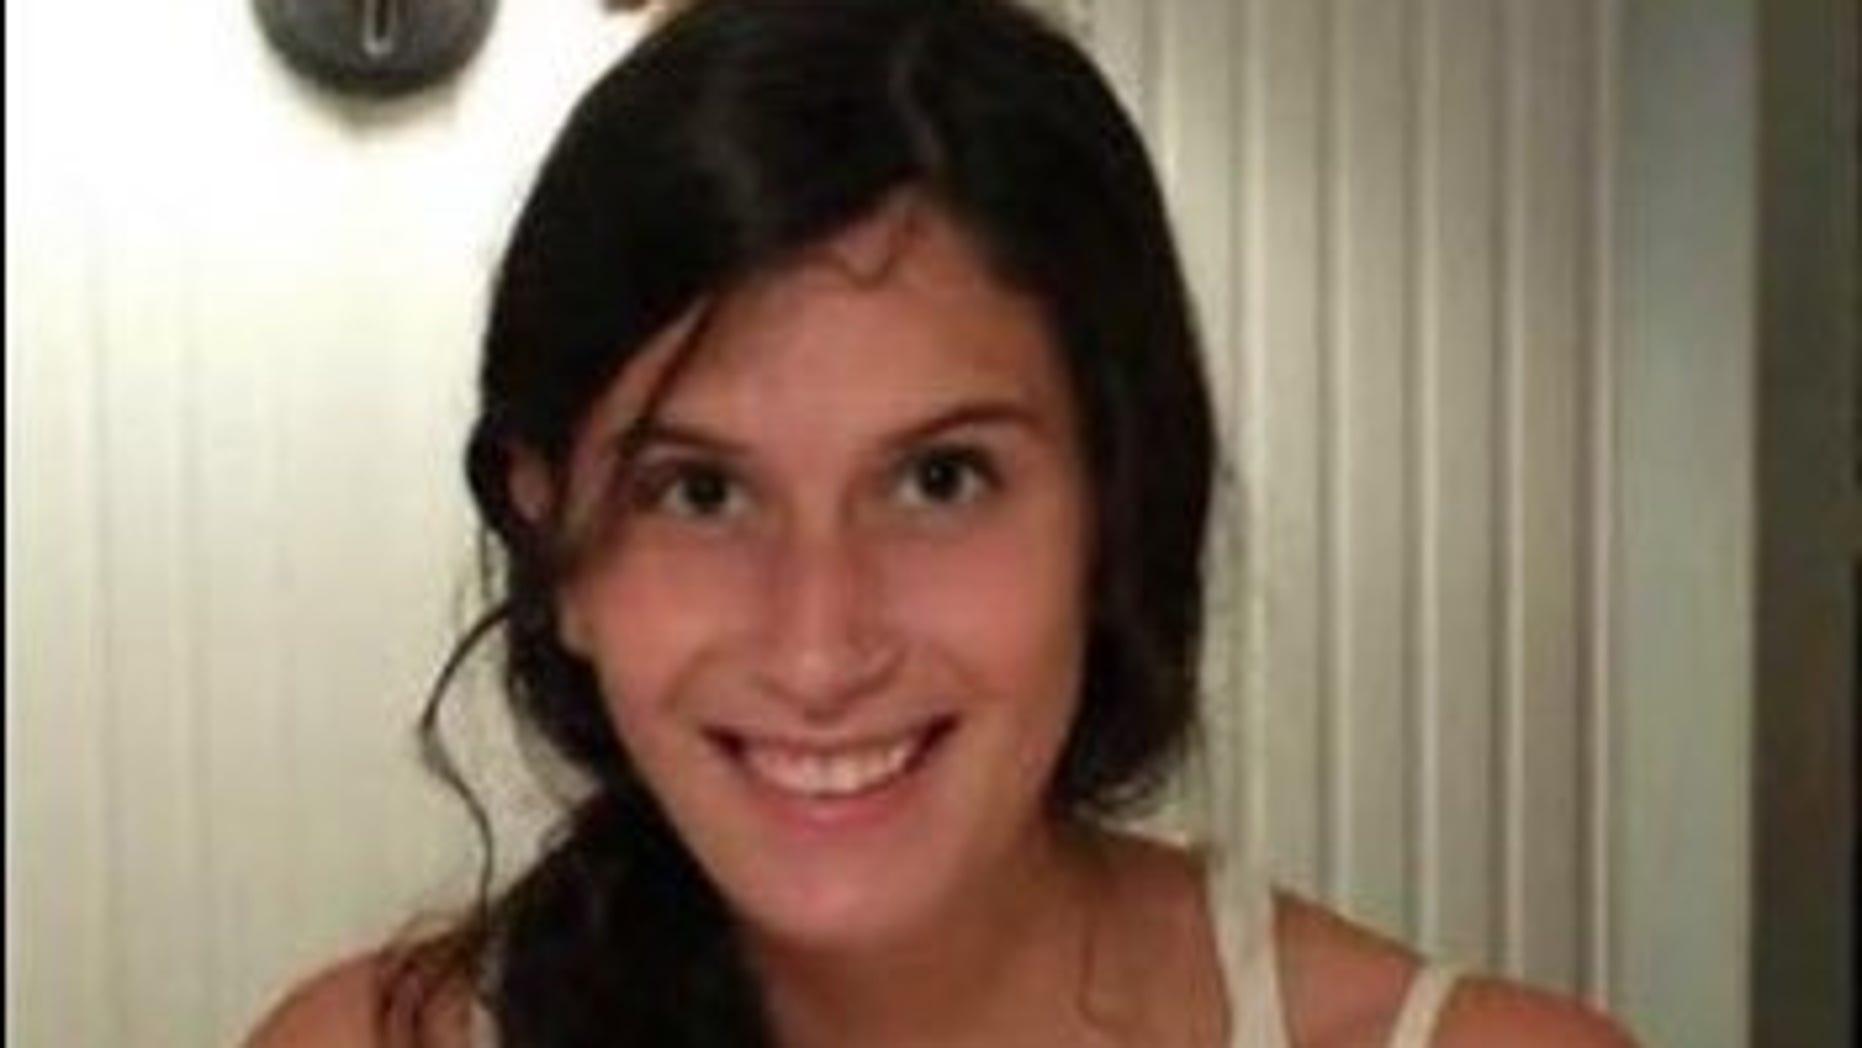 Catherine Johannet was found strangled near a Panama beach in February.